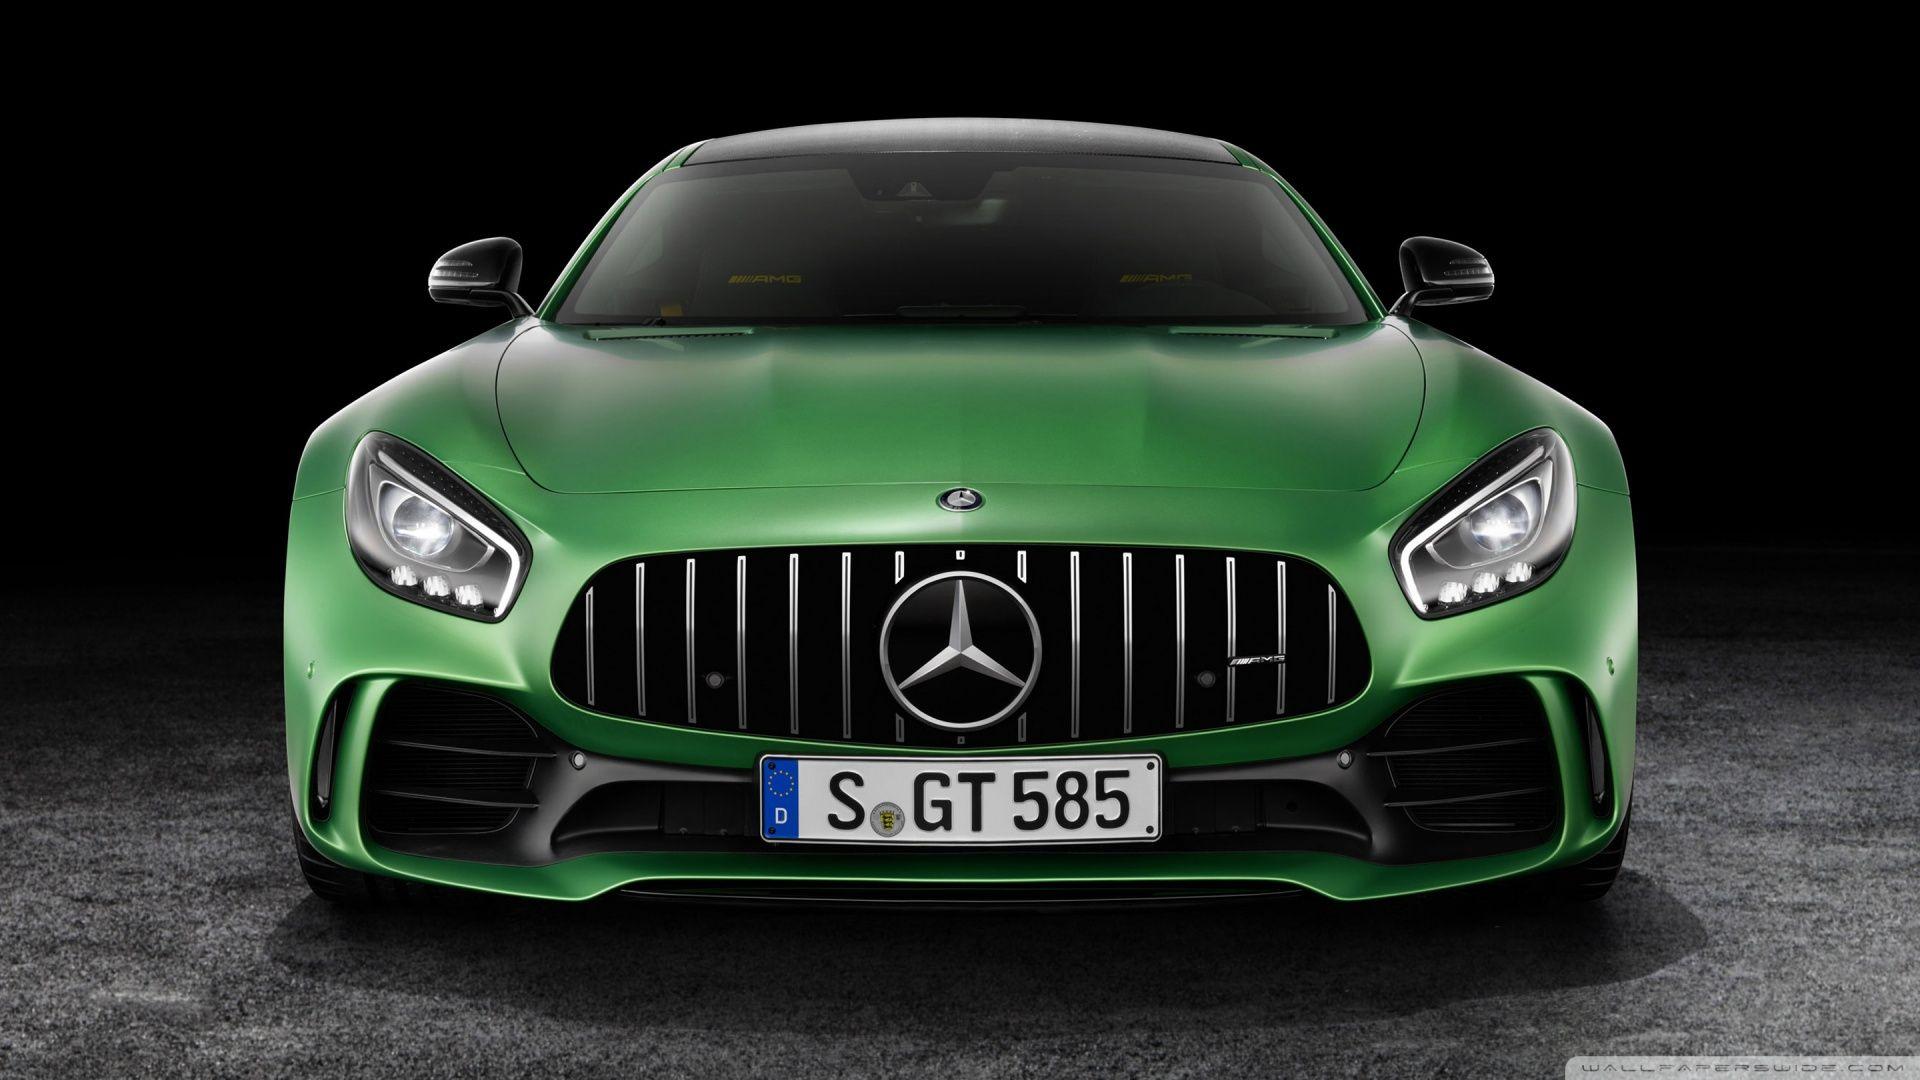 2018 Mercedes Amg Gt R Ultra Hd Wallpaper For 4k Uhd Widescreen Desktop Tablet Smartphone In 2020 Mercedes Benz Amg Mercedes Amg Gt R Mercedes Benz India